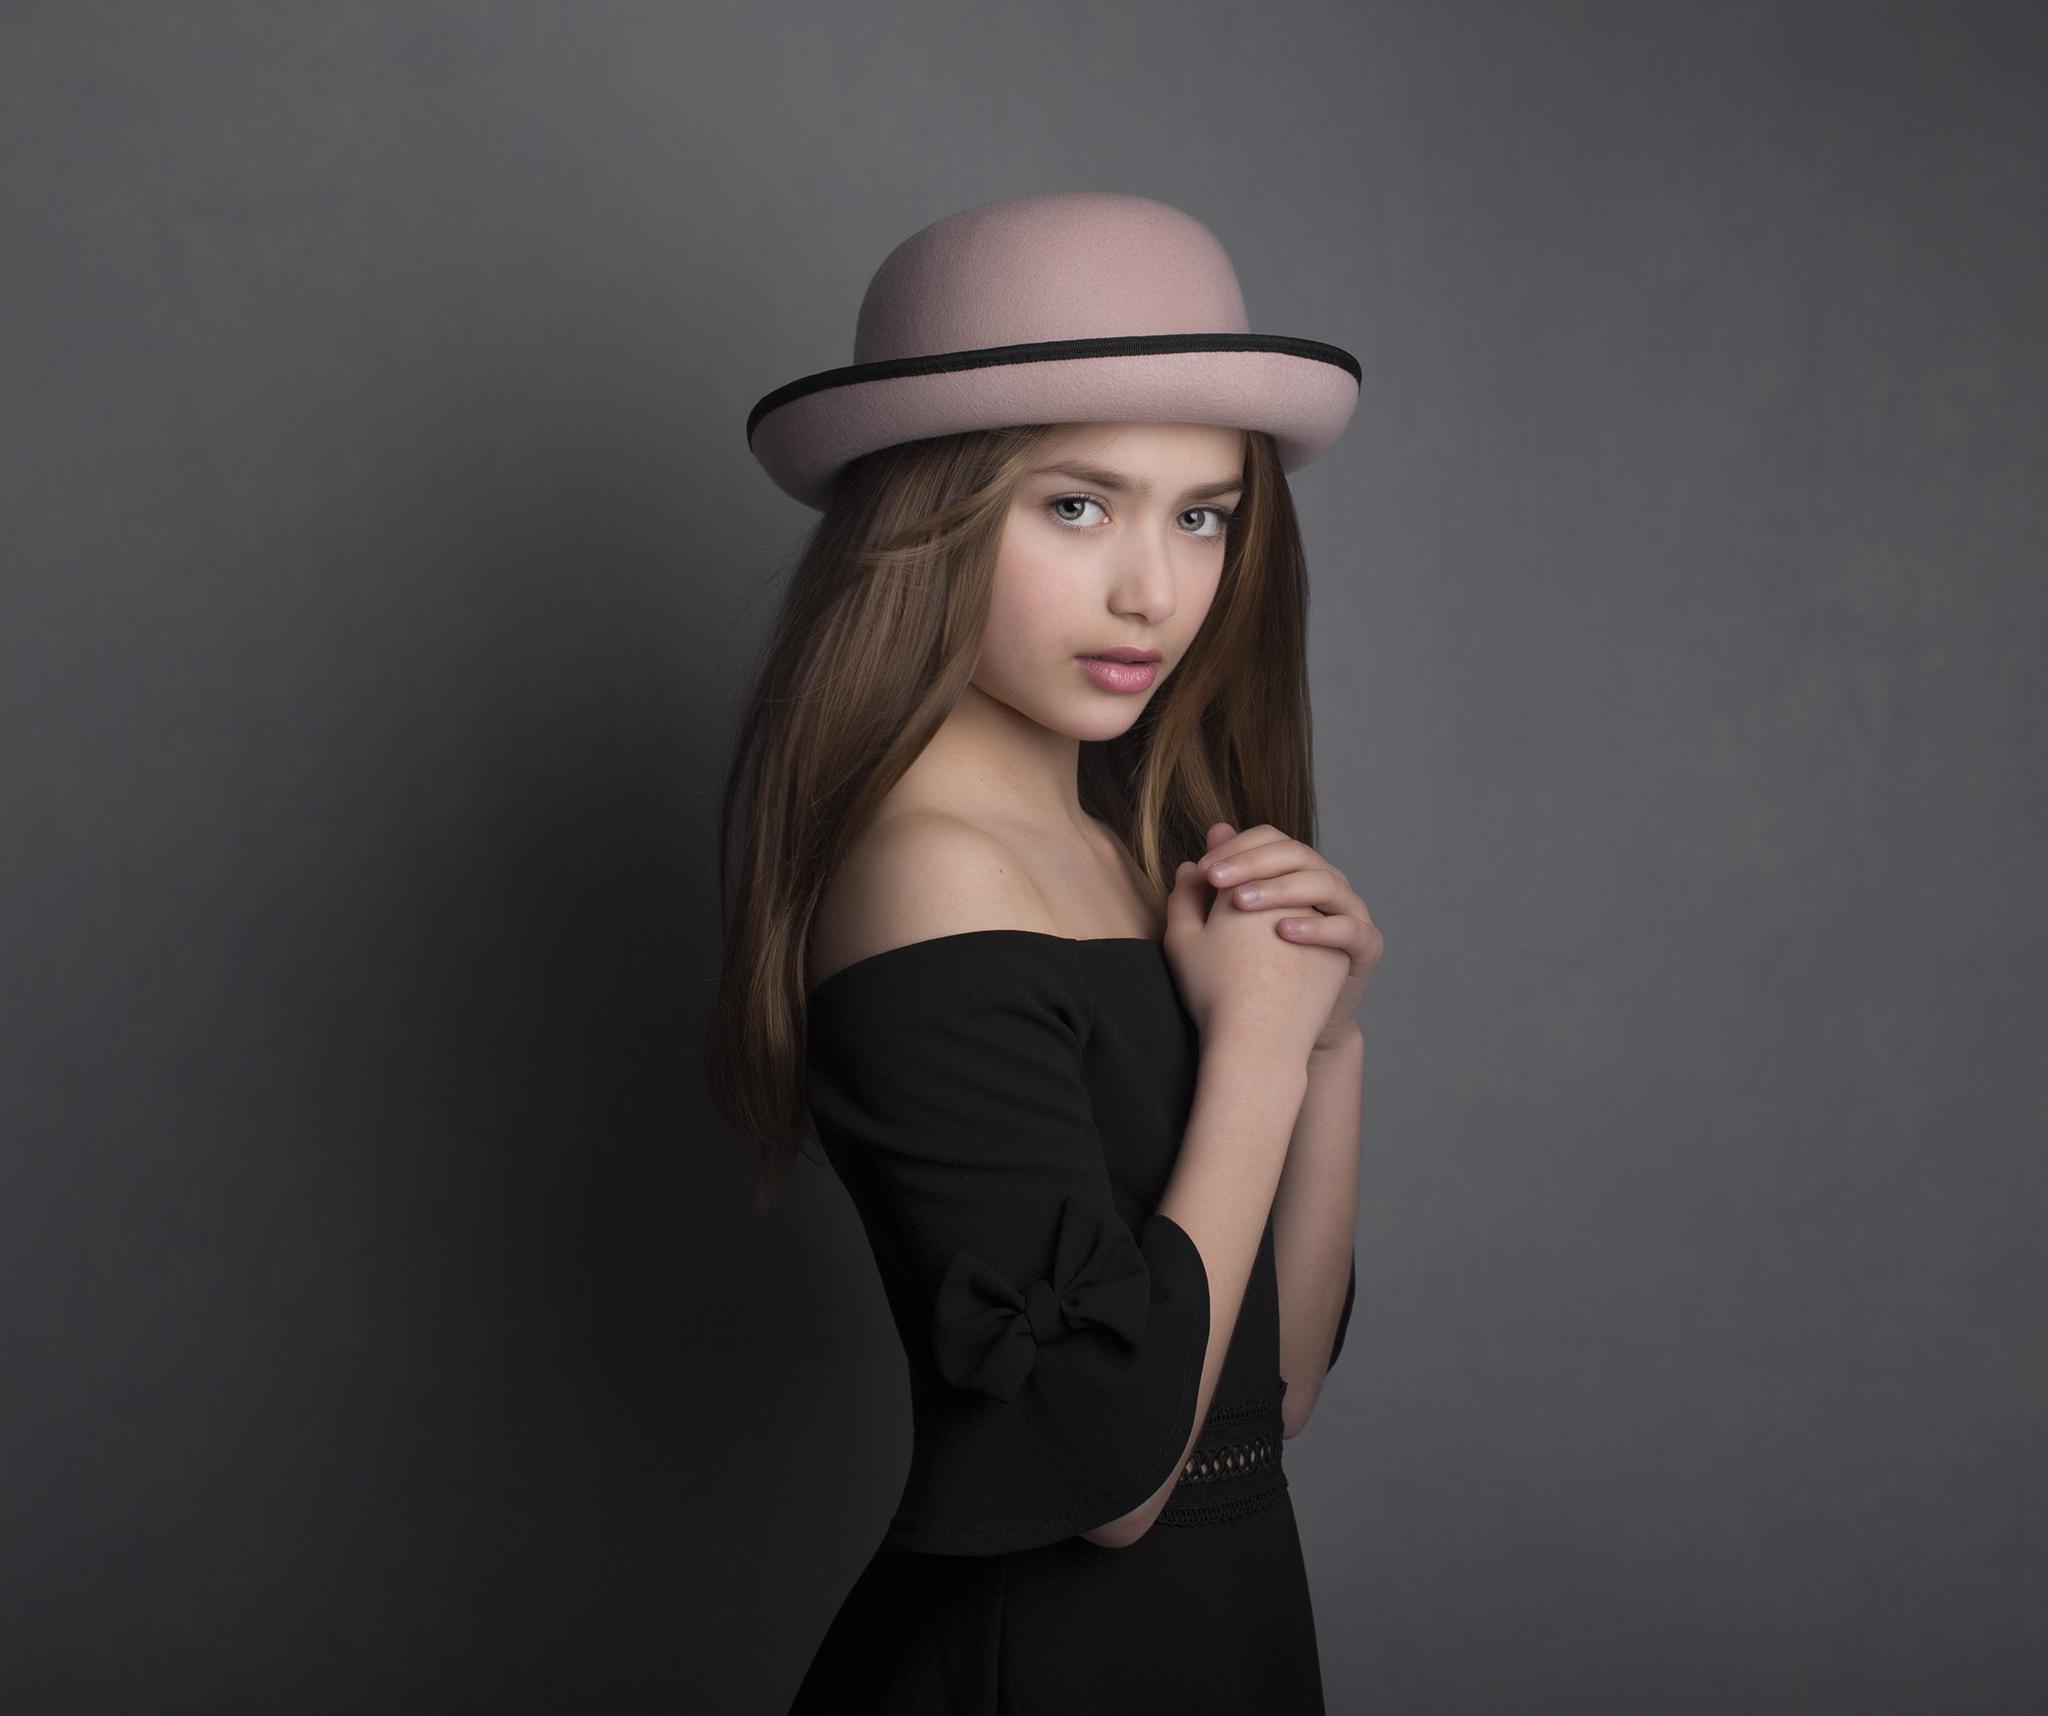 elizabethgphotography_fineart_kingslangley_hertfordshire_model_portfolios_031.jpg